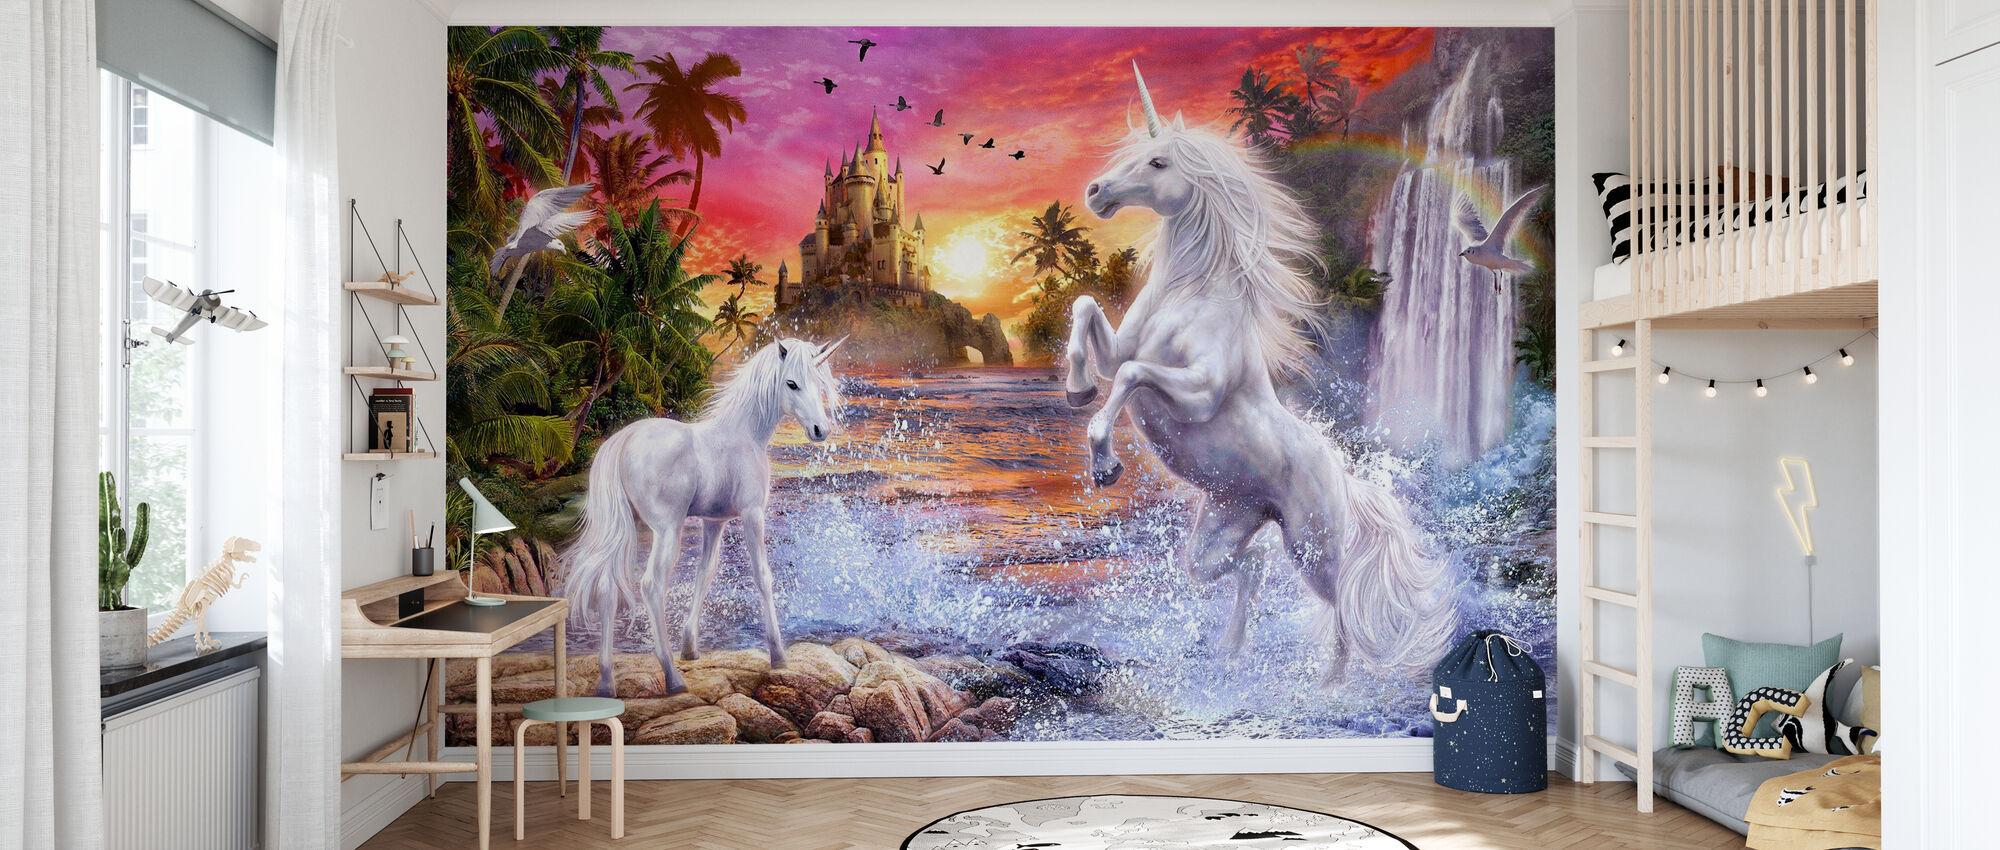 Unicorn Waterfall Sunset - Wallpaper - Kids Room